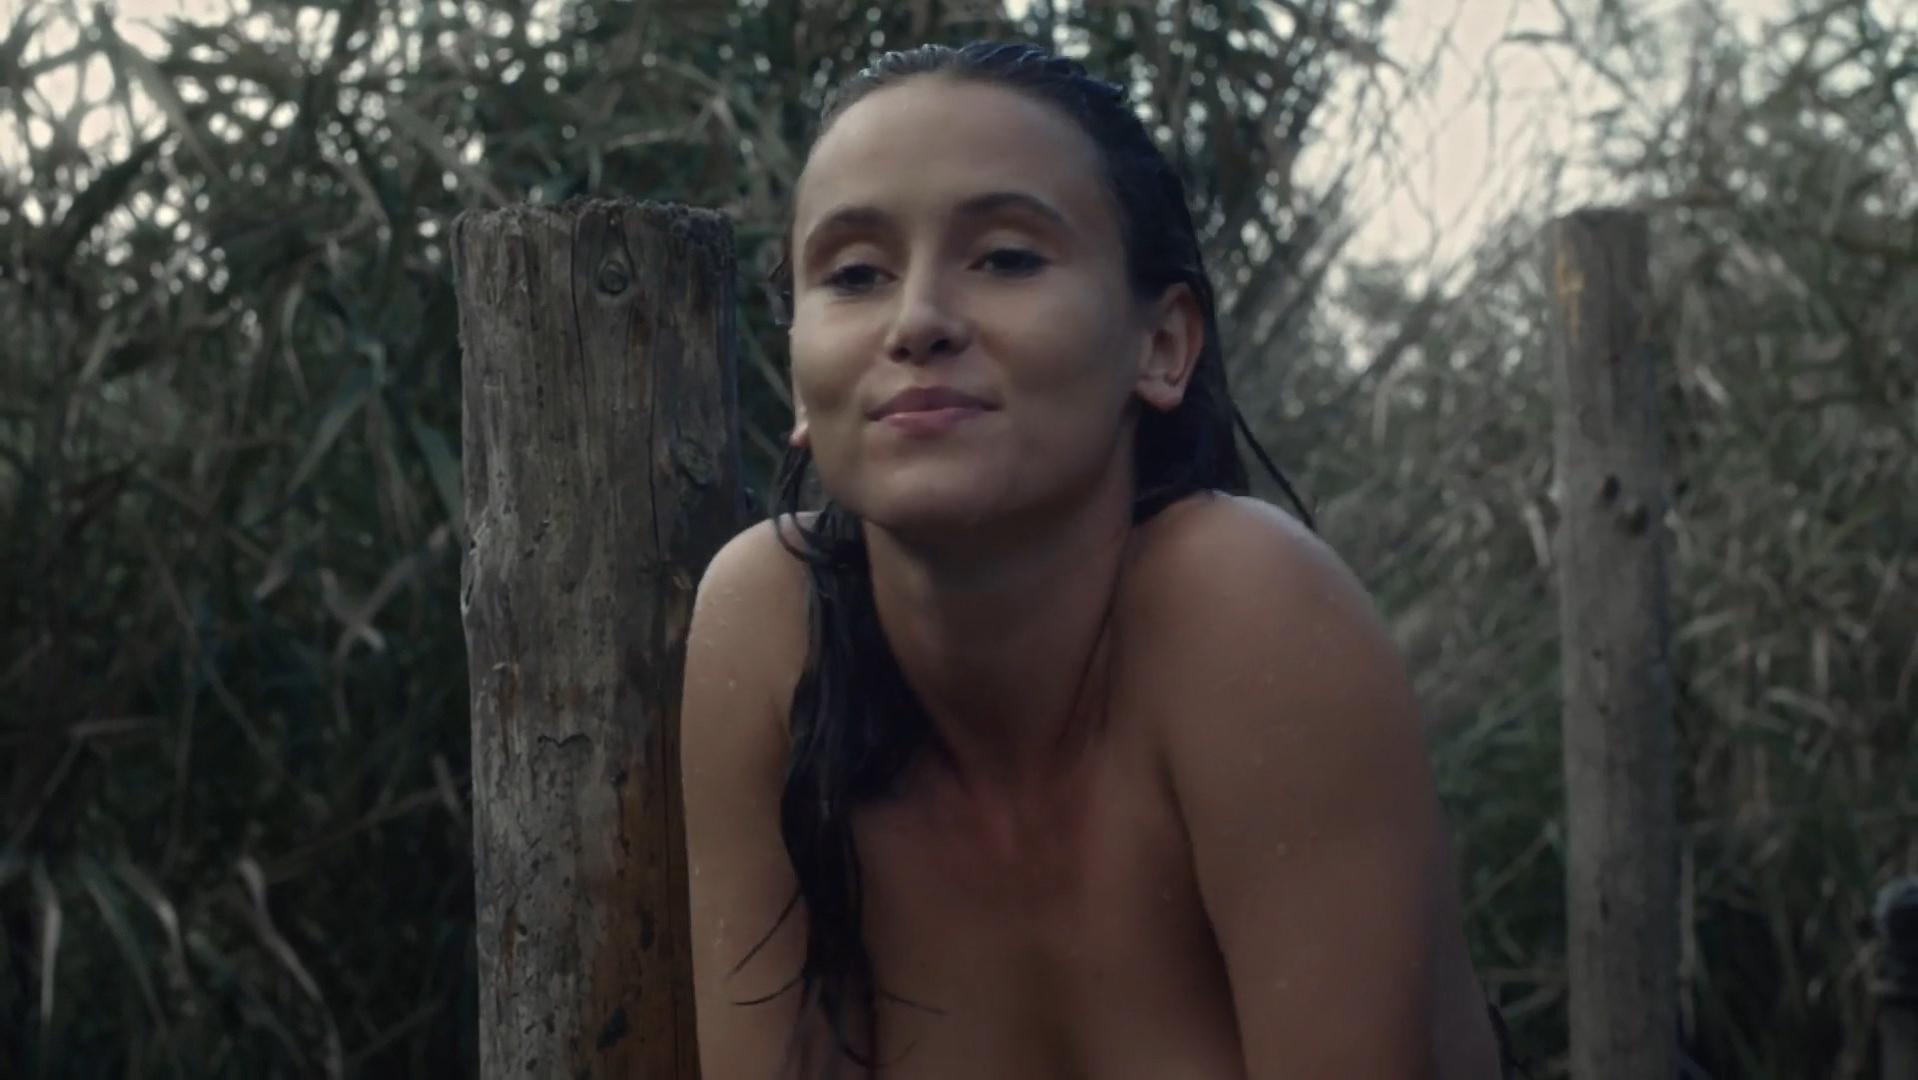 Peri Baumeister nude - The Last Kingdom s02e06 (2017)